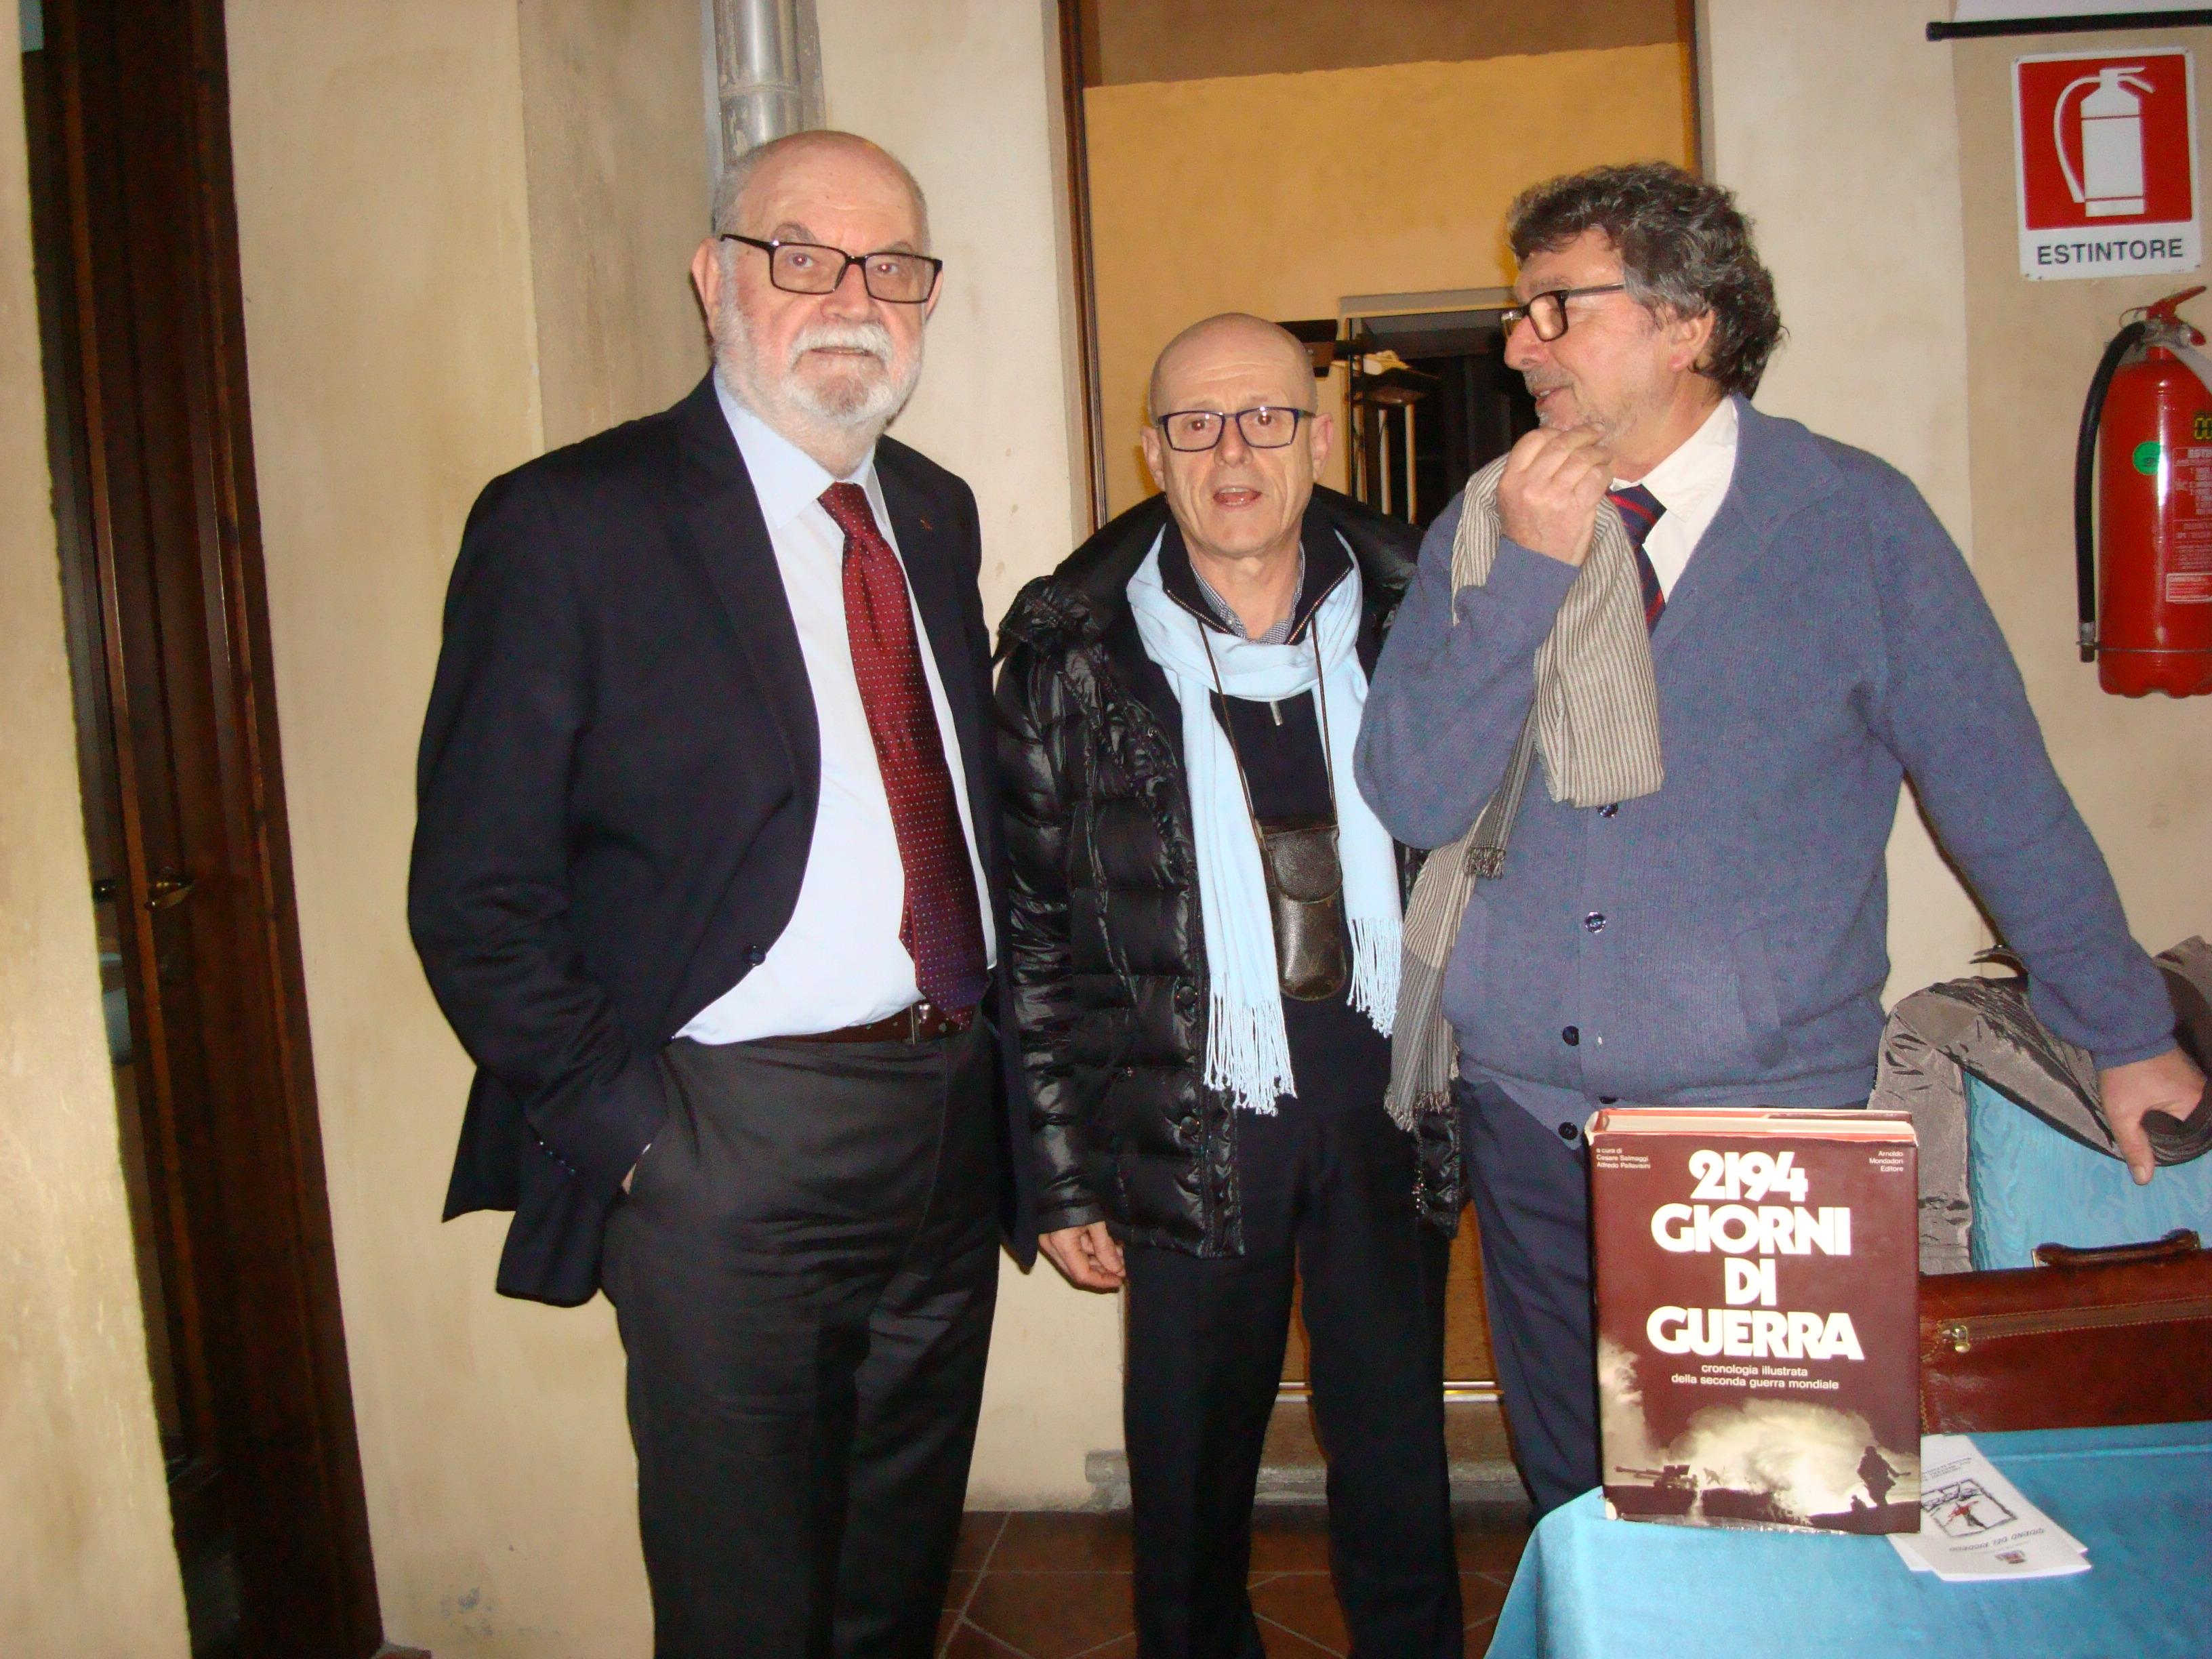 Tarticchio-Pallavisini-Perrone